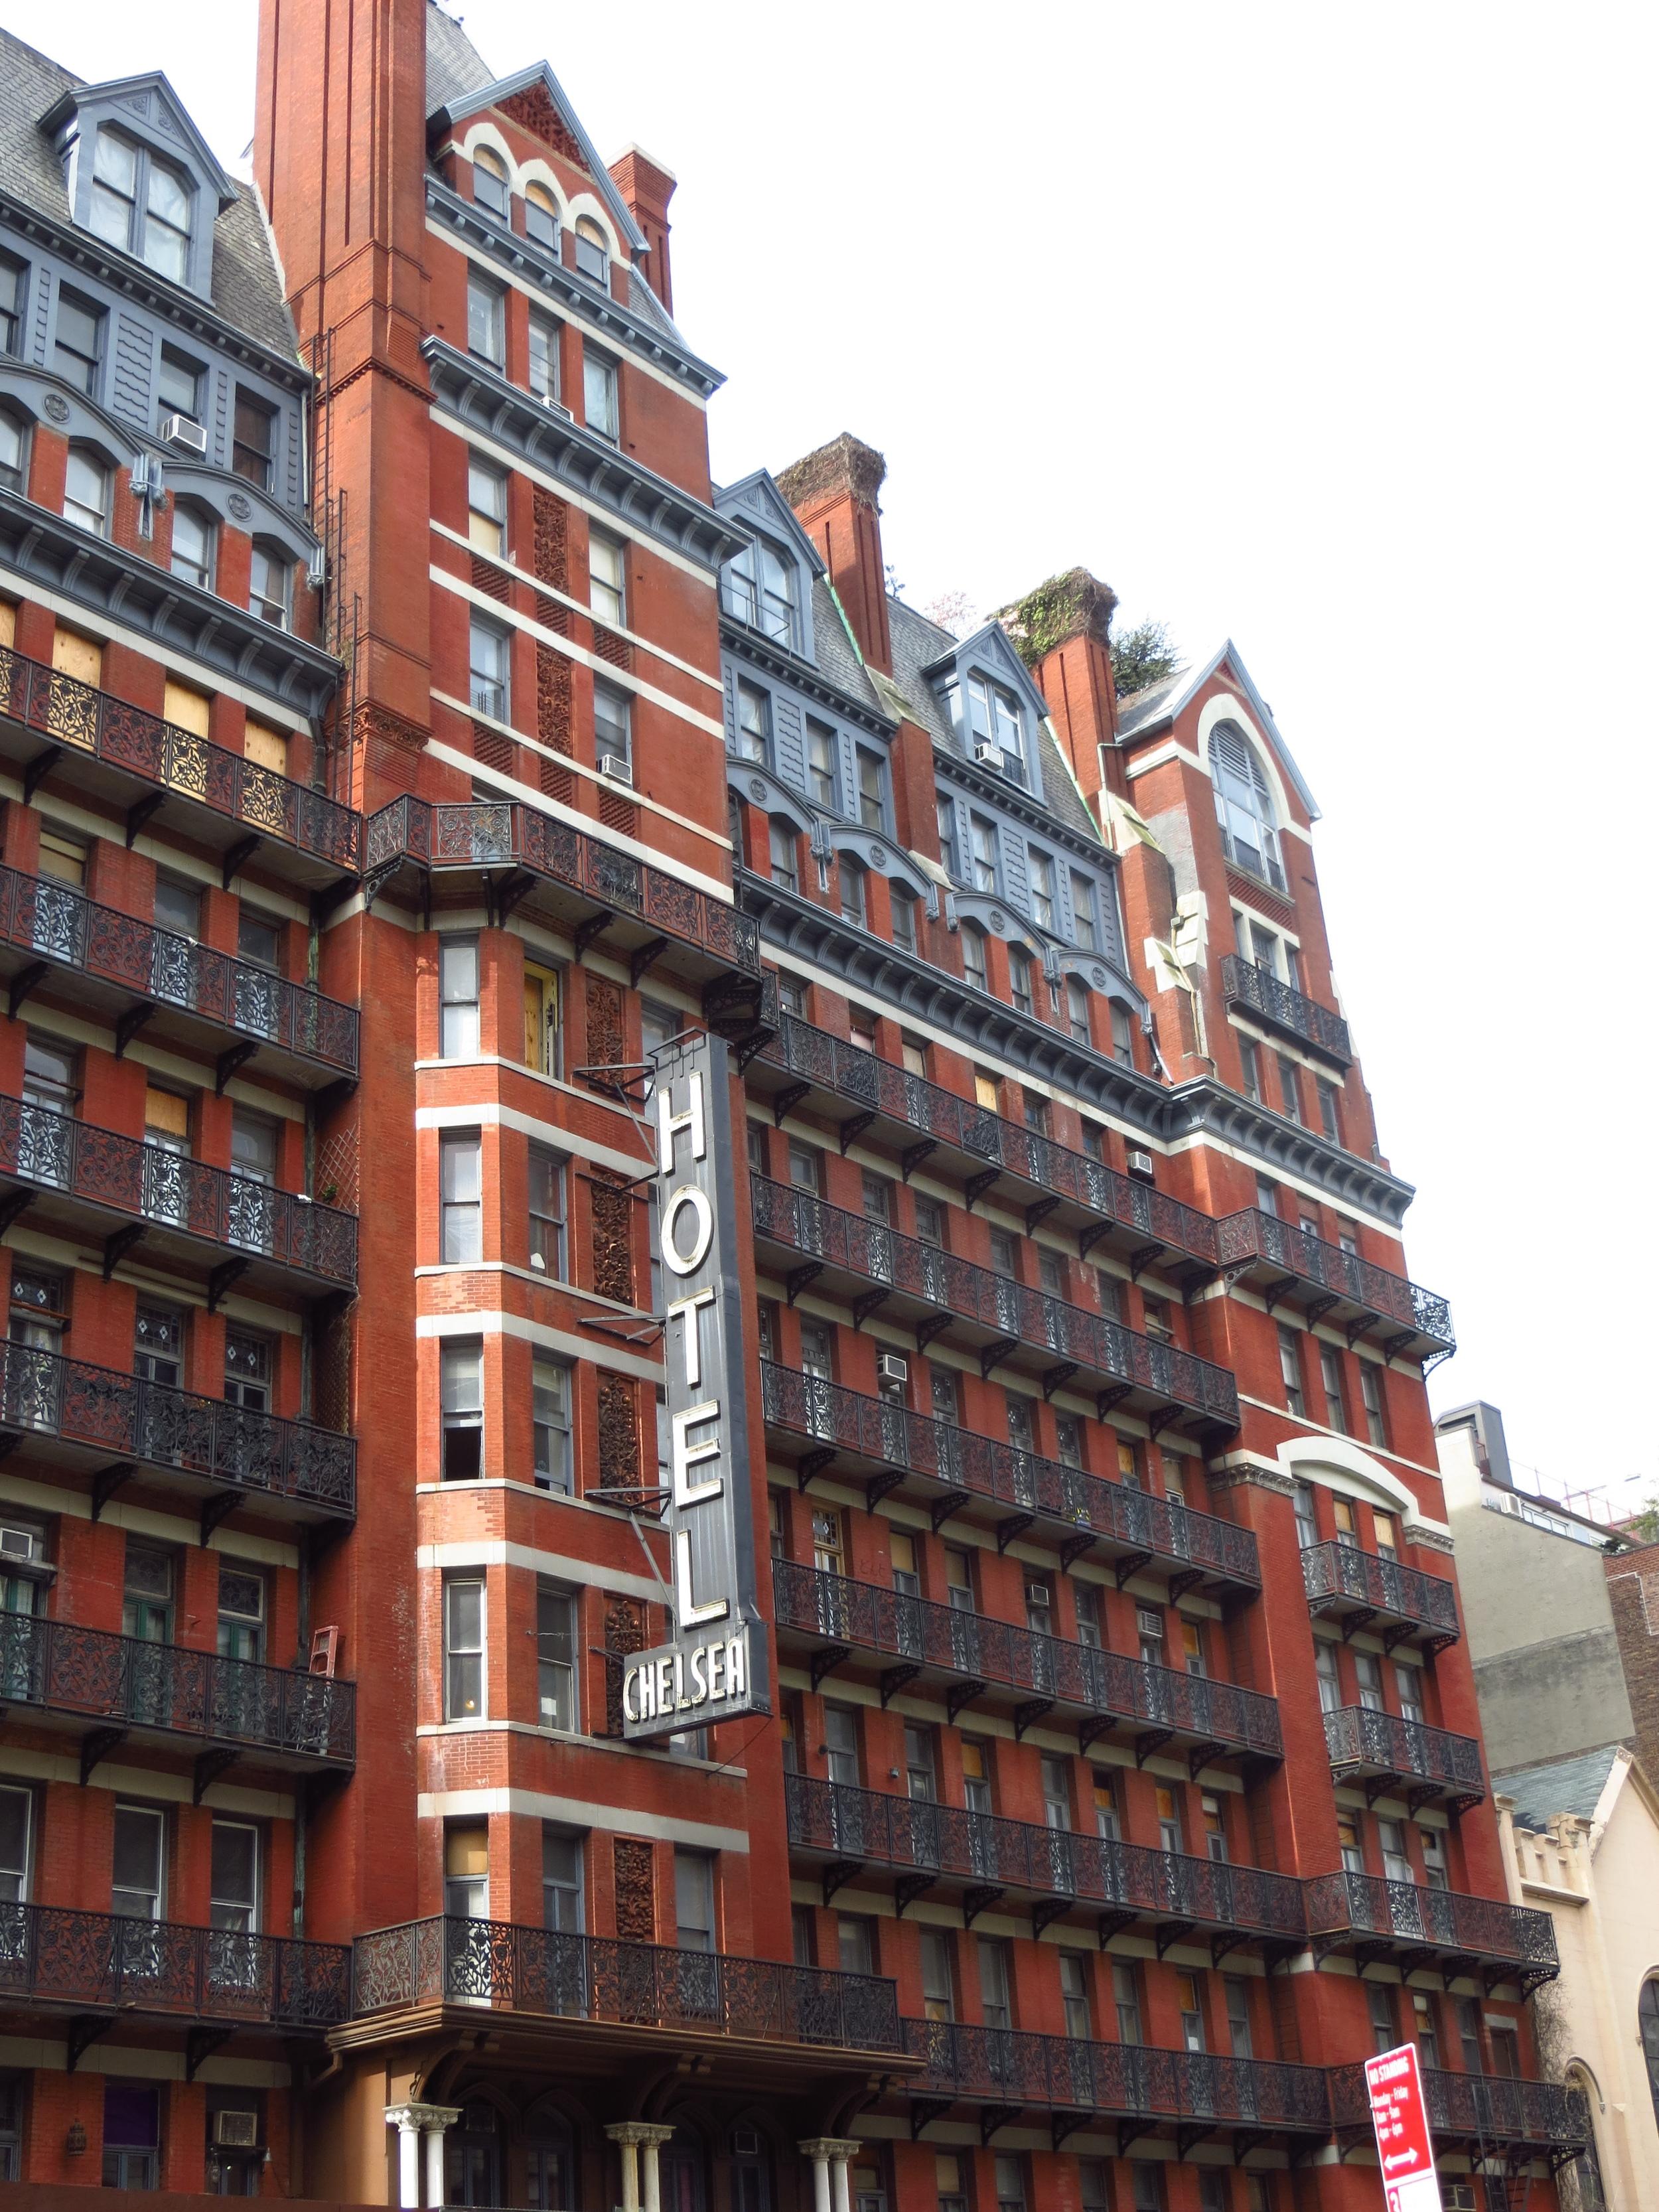 Hotel Chelsea (built 1884)